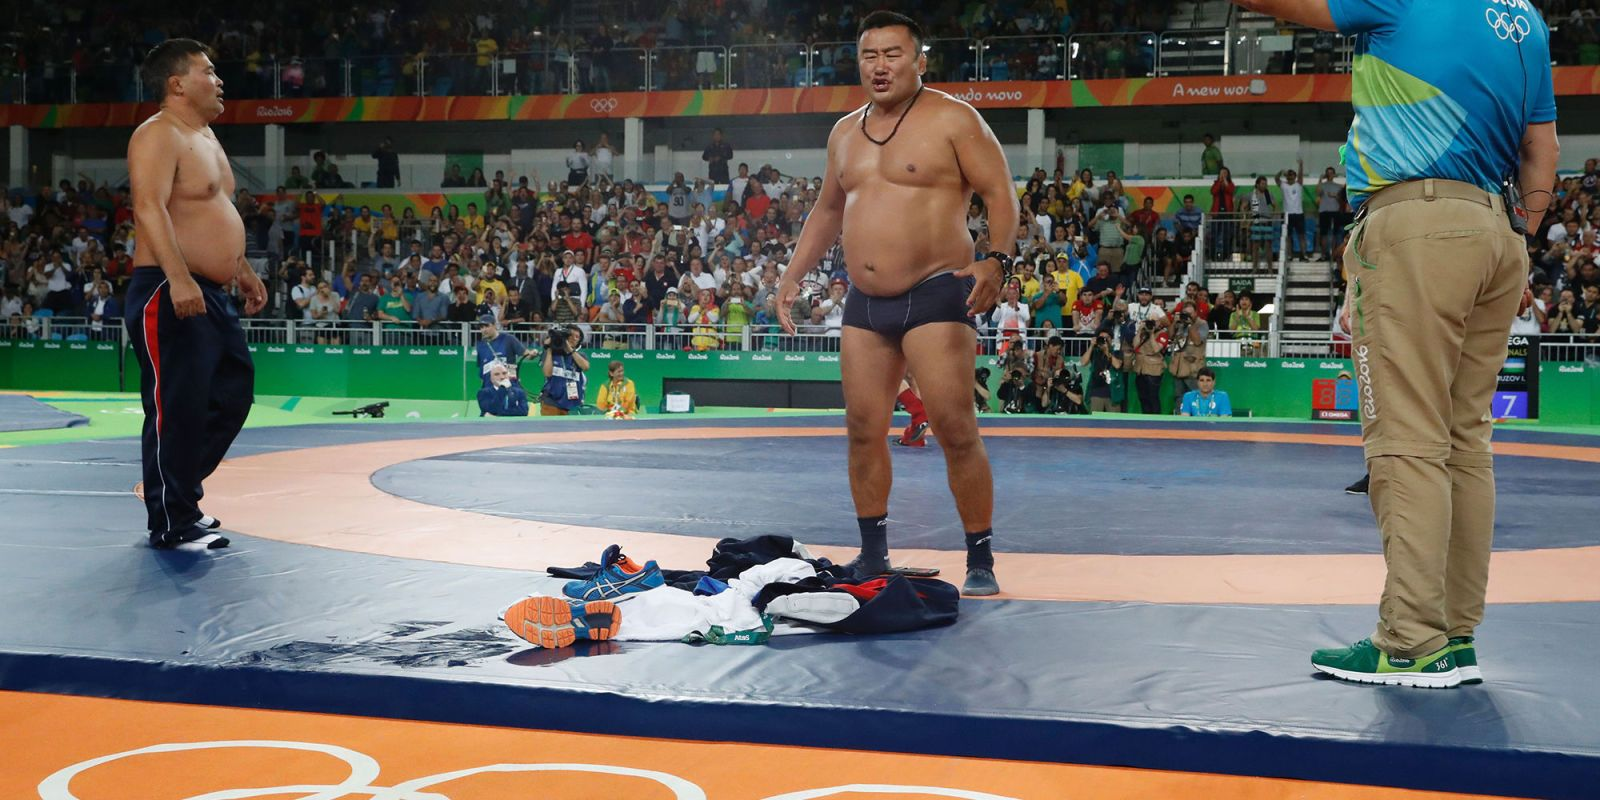 Mens strip wrestling photos